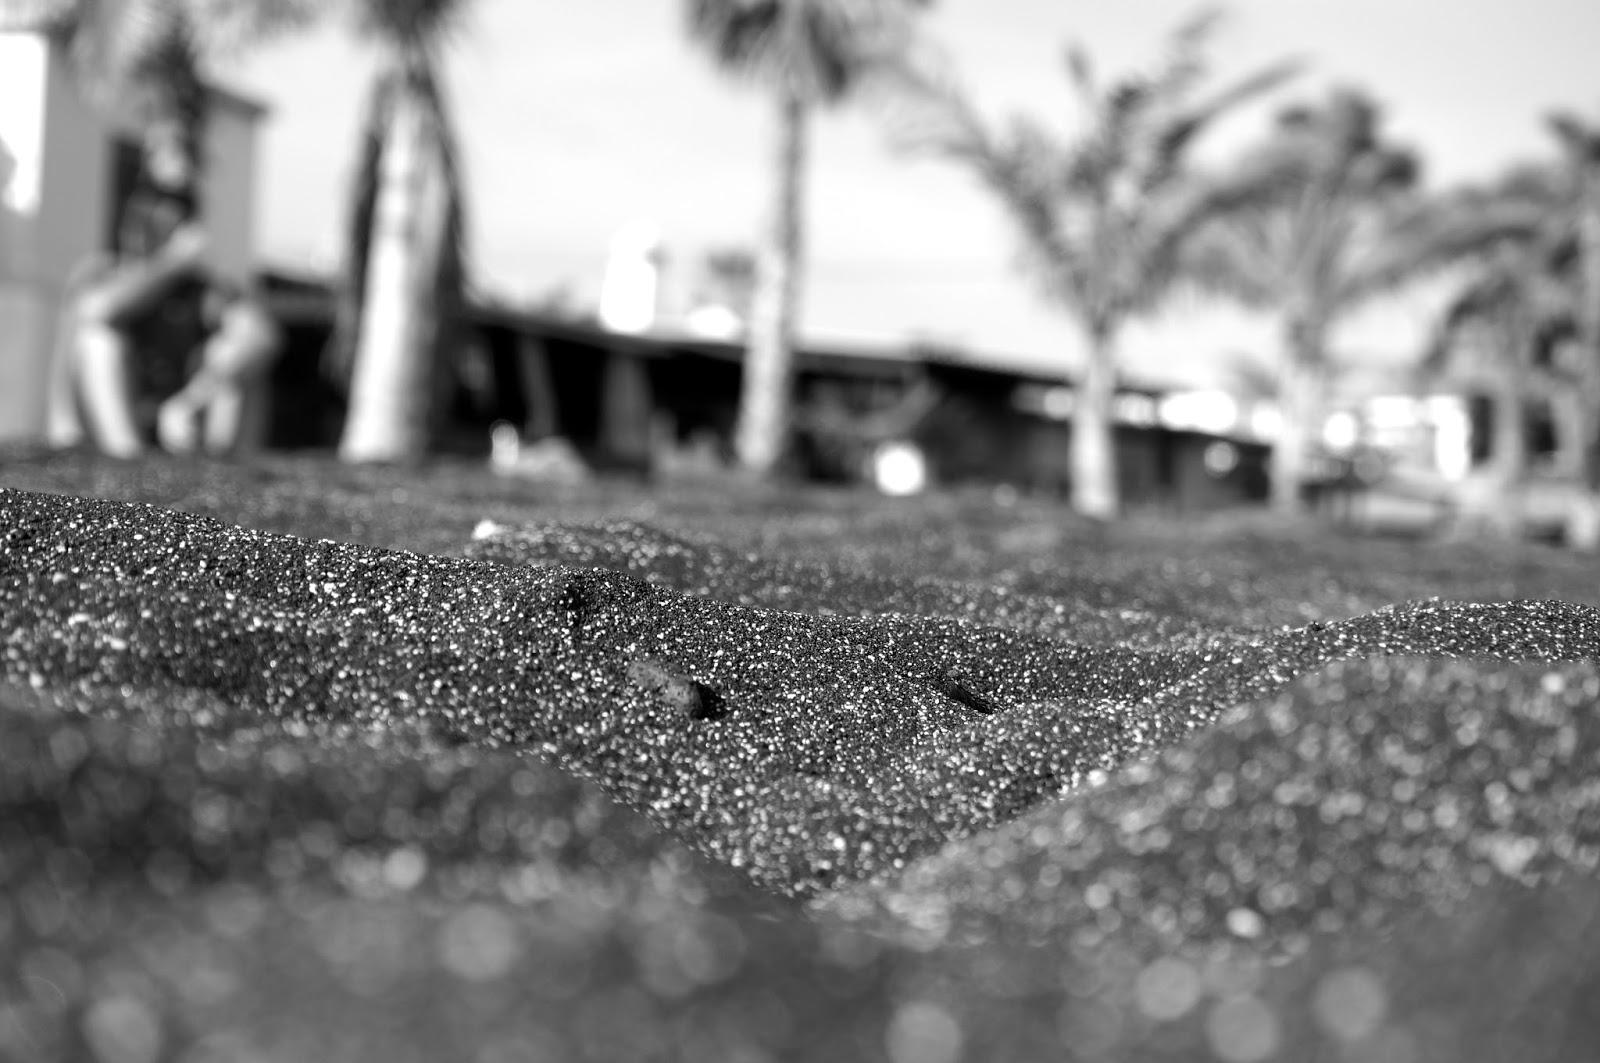 Runssel in pictures isla de la palma parte dos - Div onclick href ...